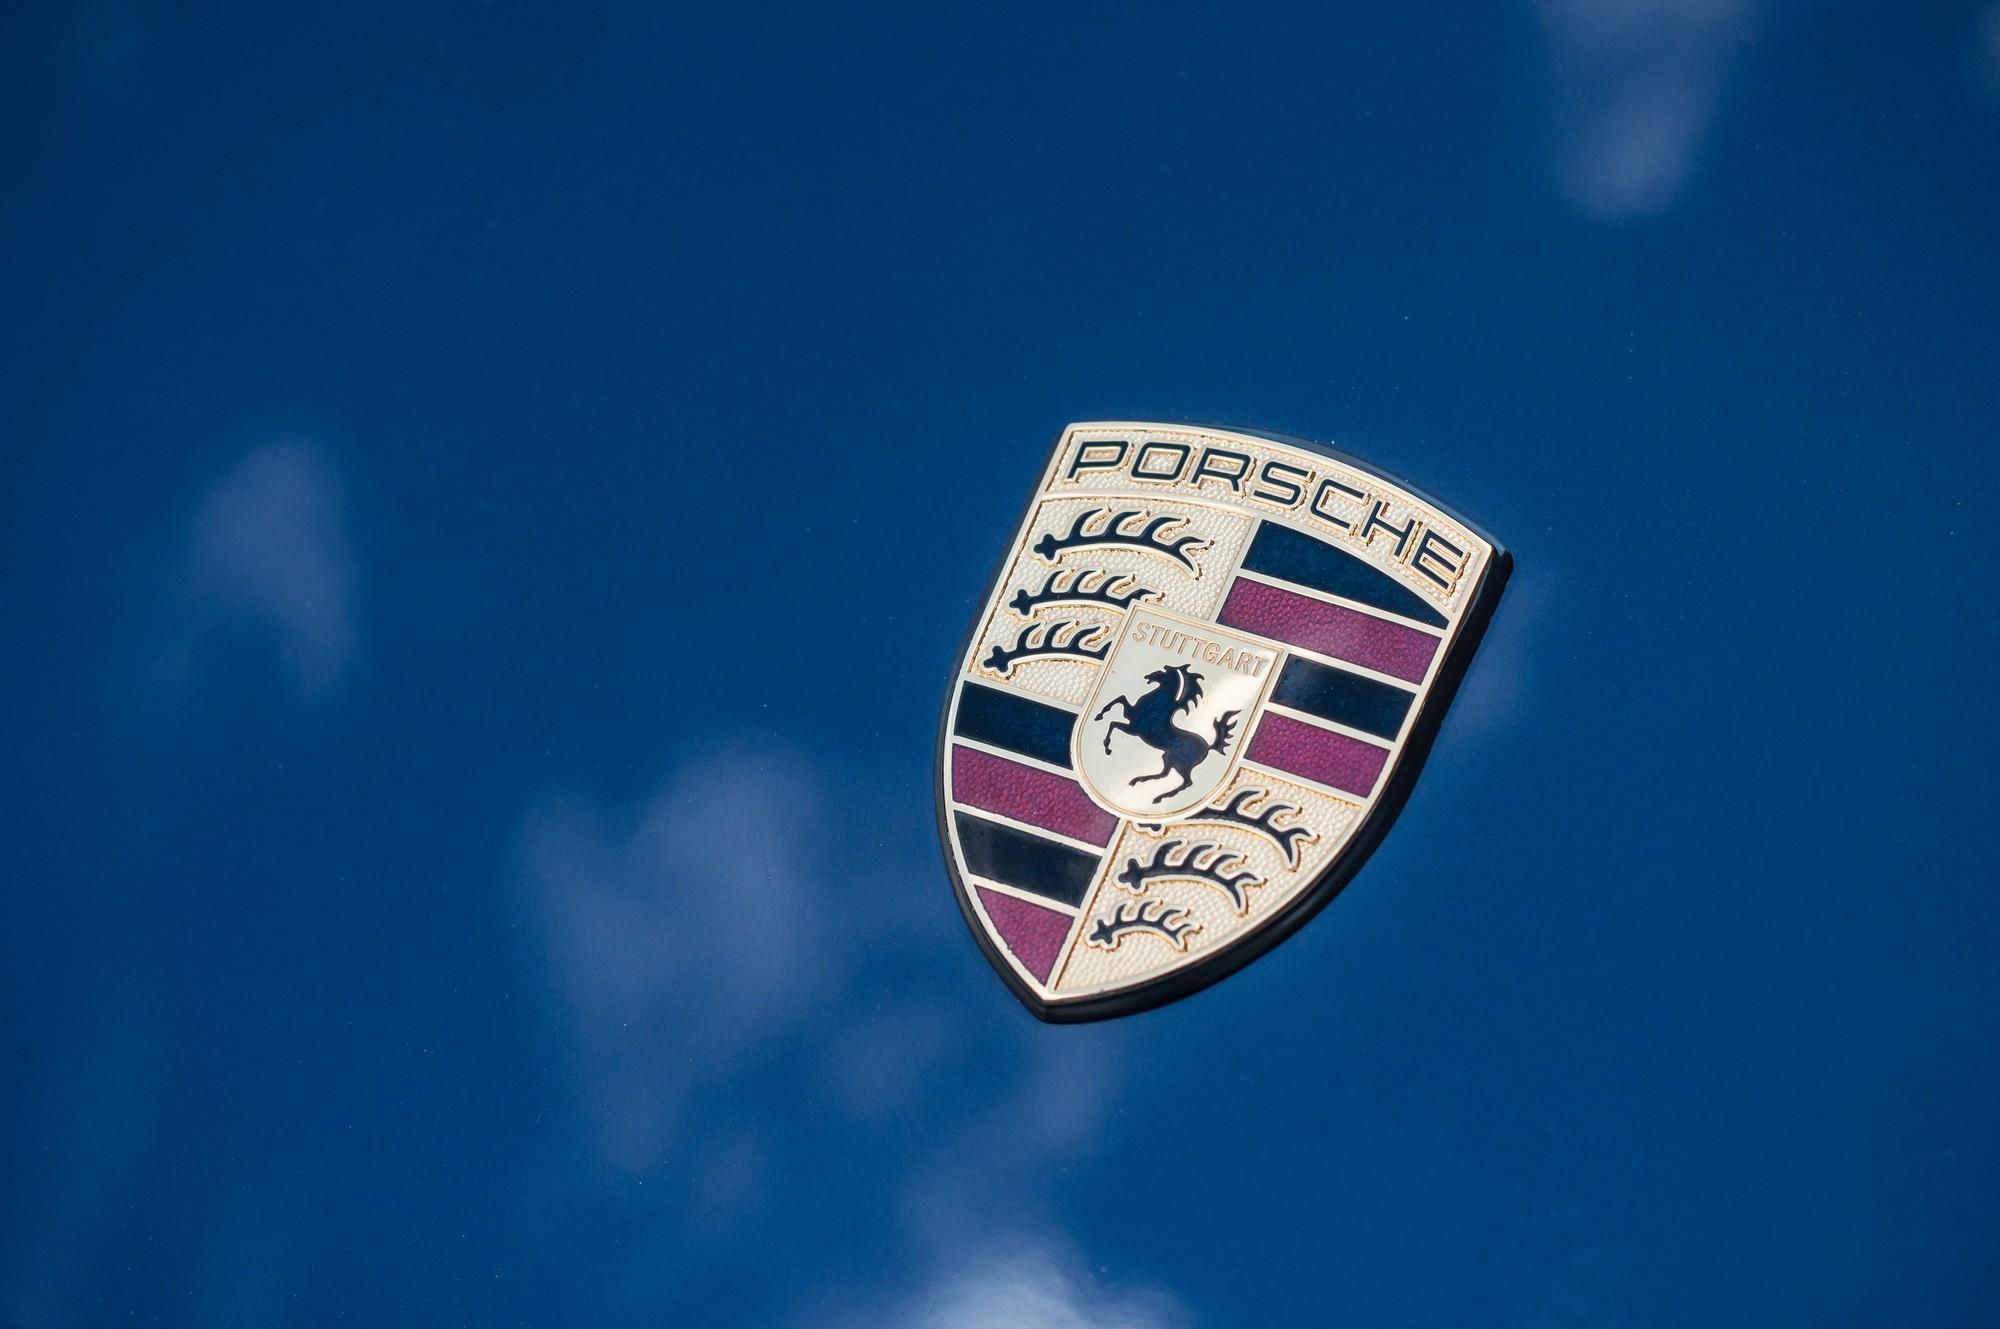 Le succès de Porsche